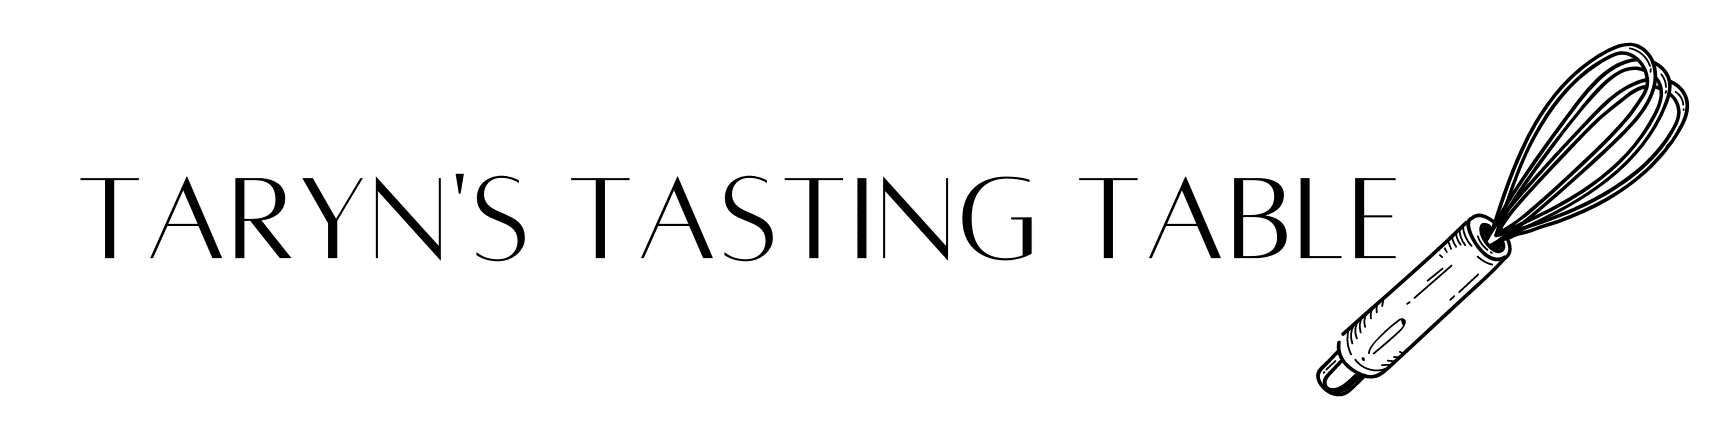 Taryn's Tasting Table logo